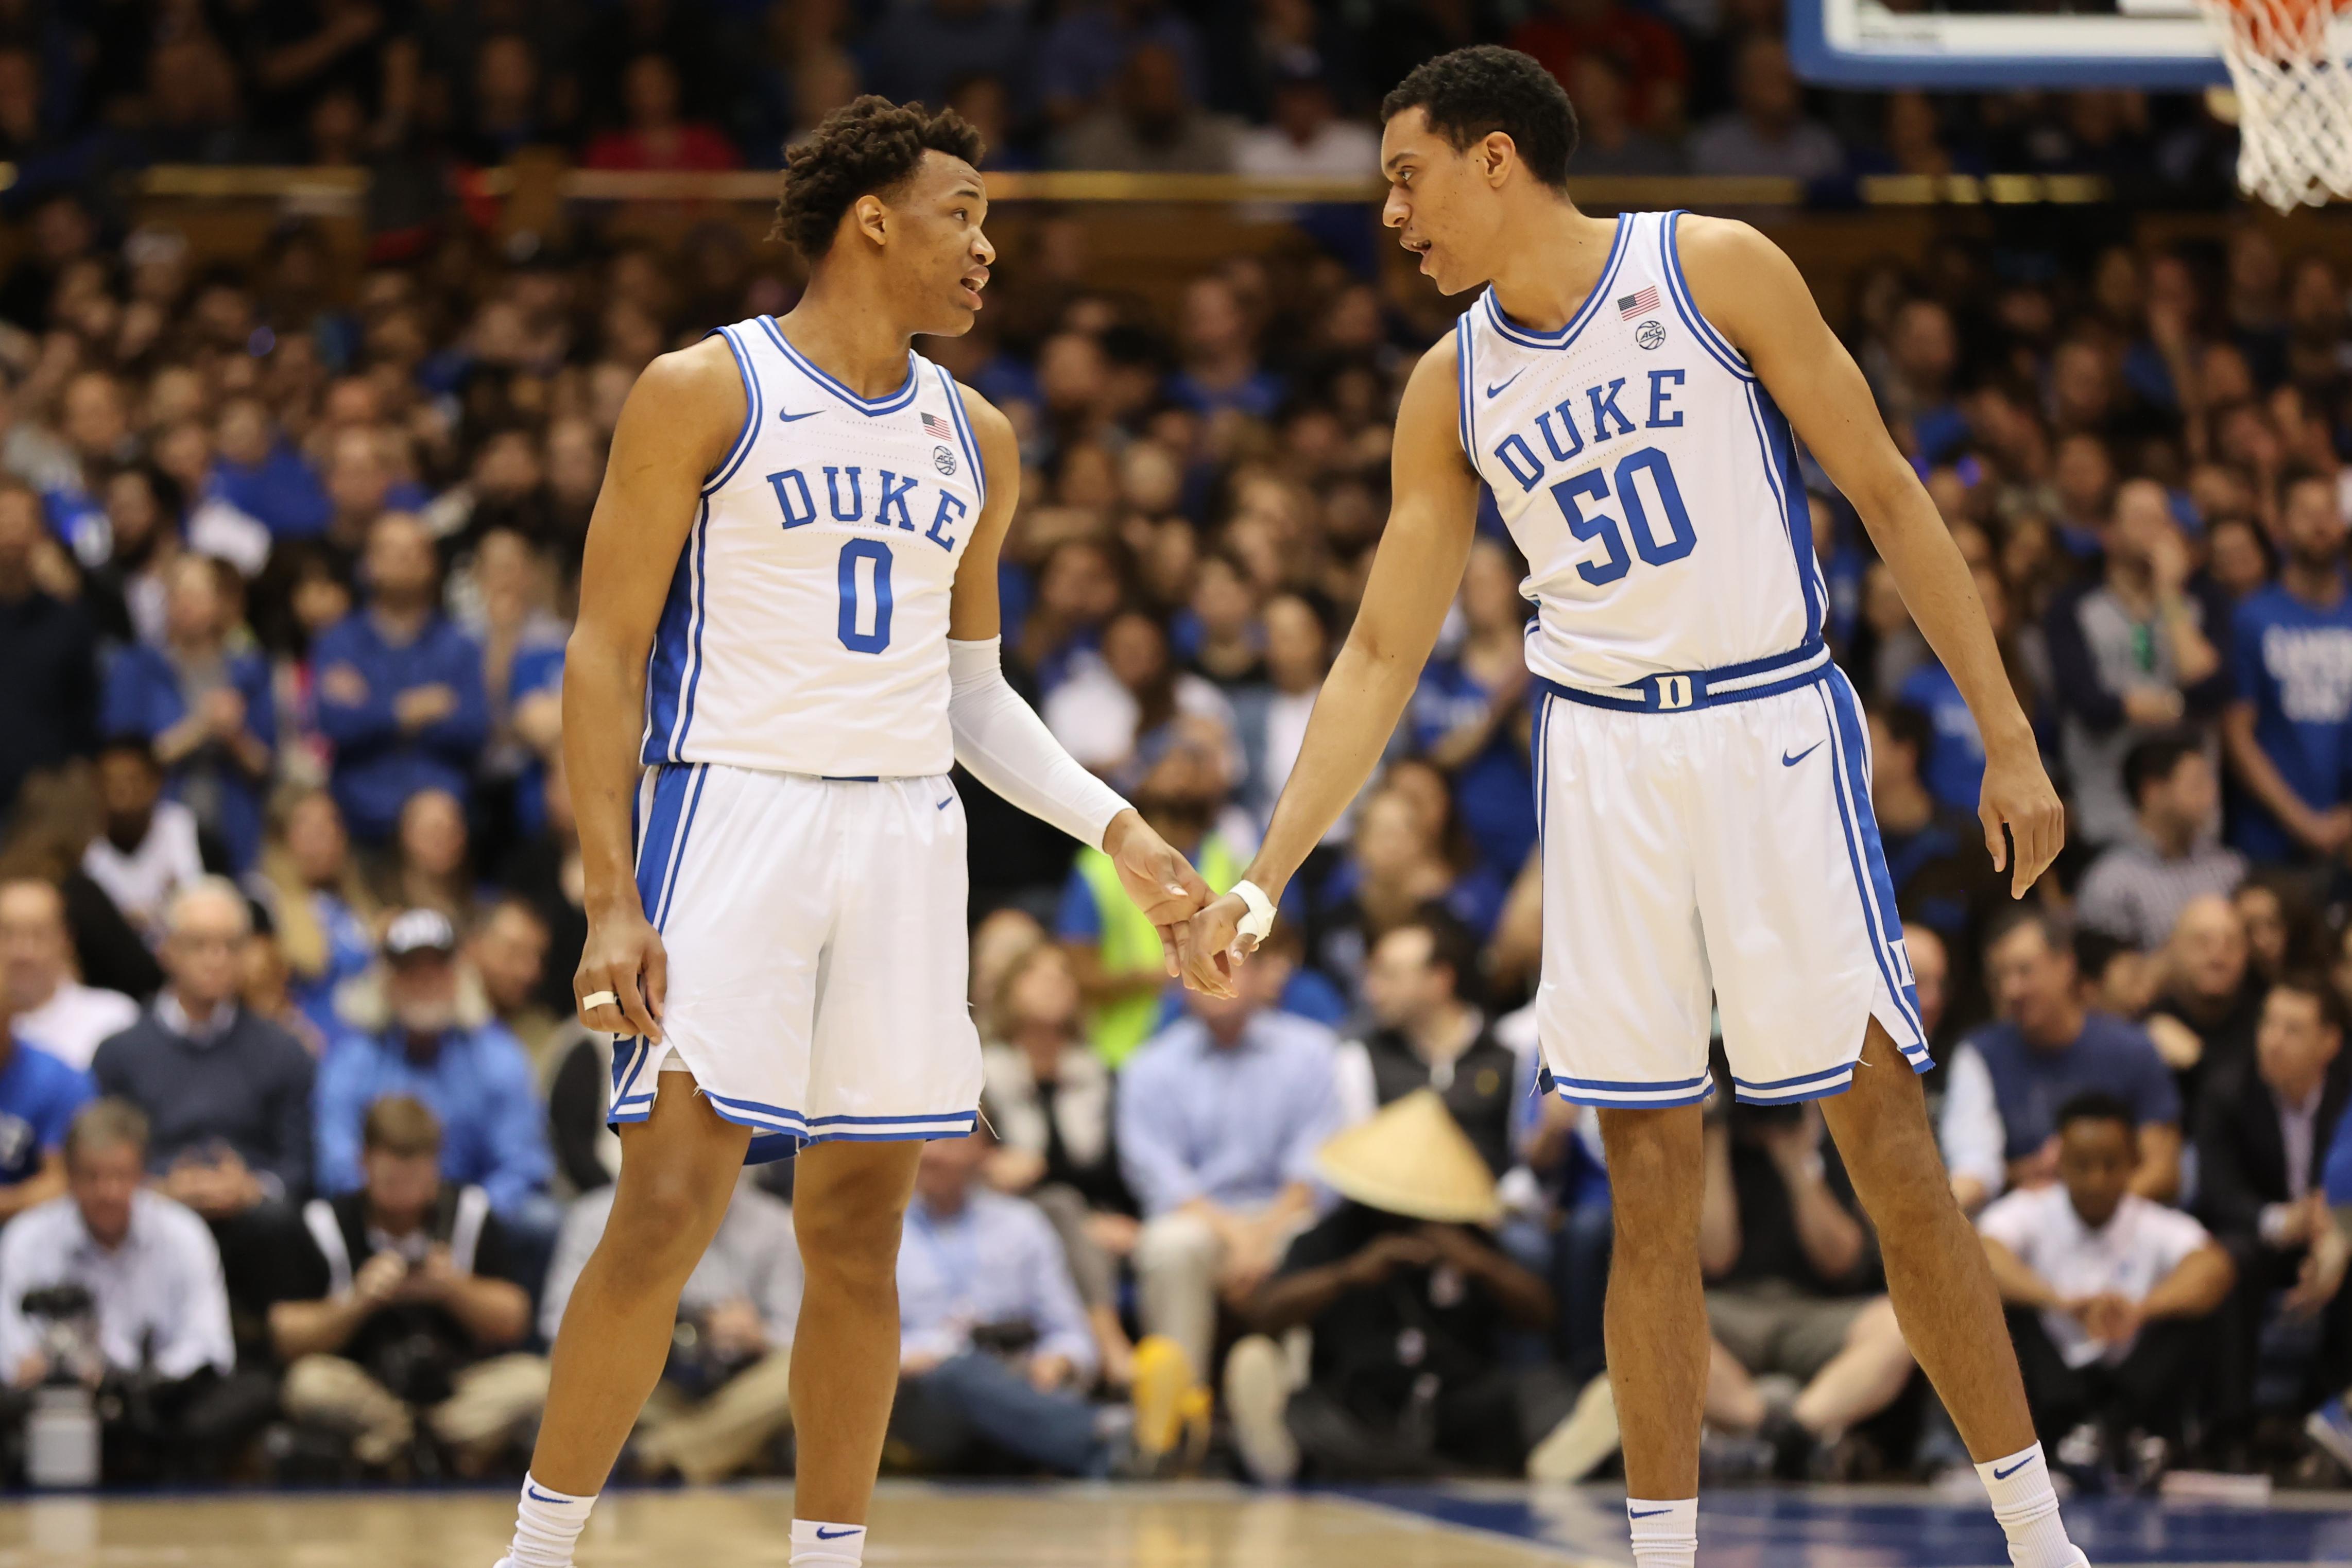 COLLEGE BASKETBALL: MAR 02 NC State at Duke